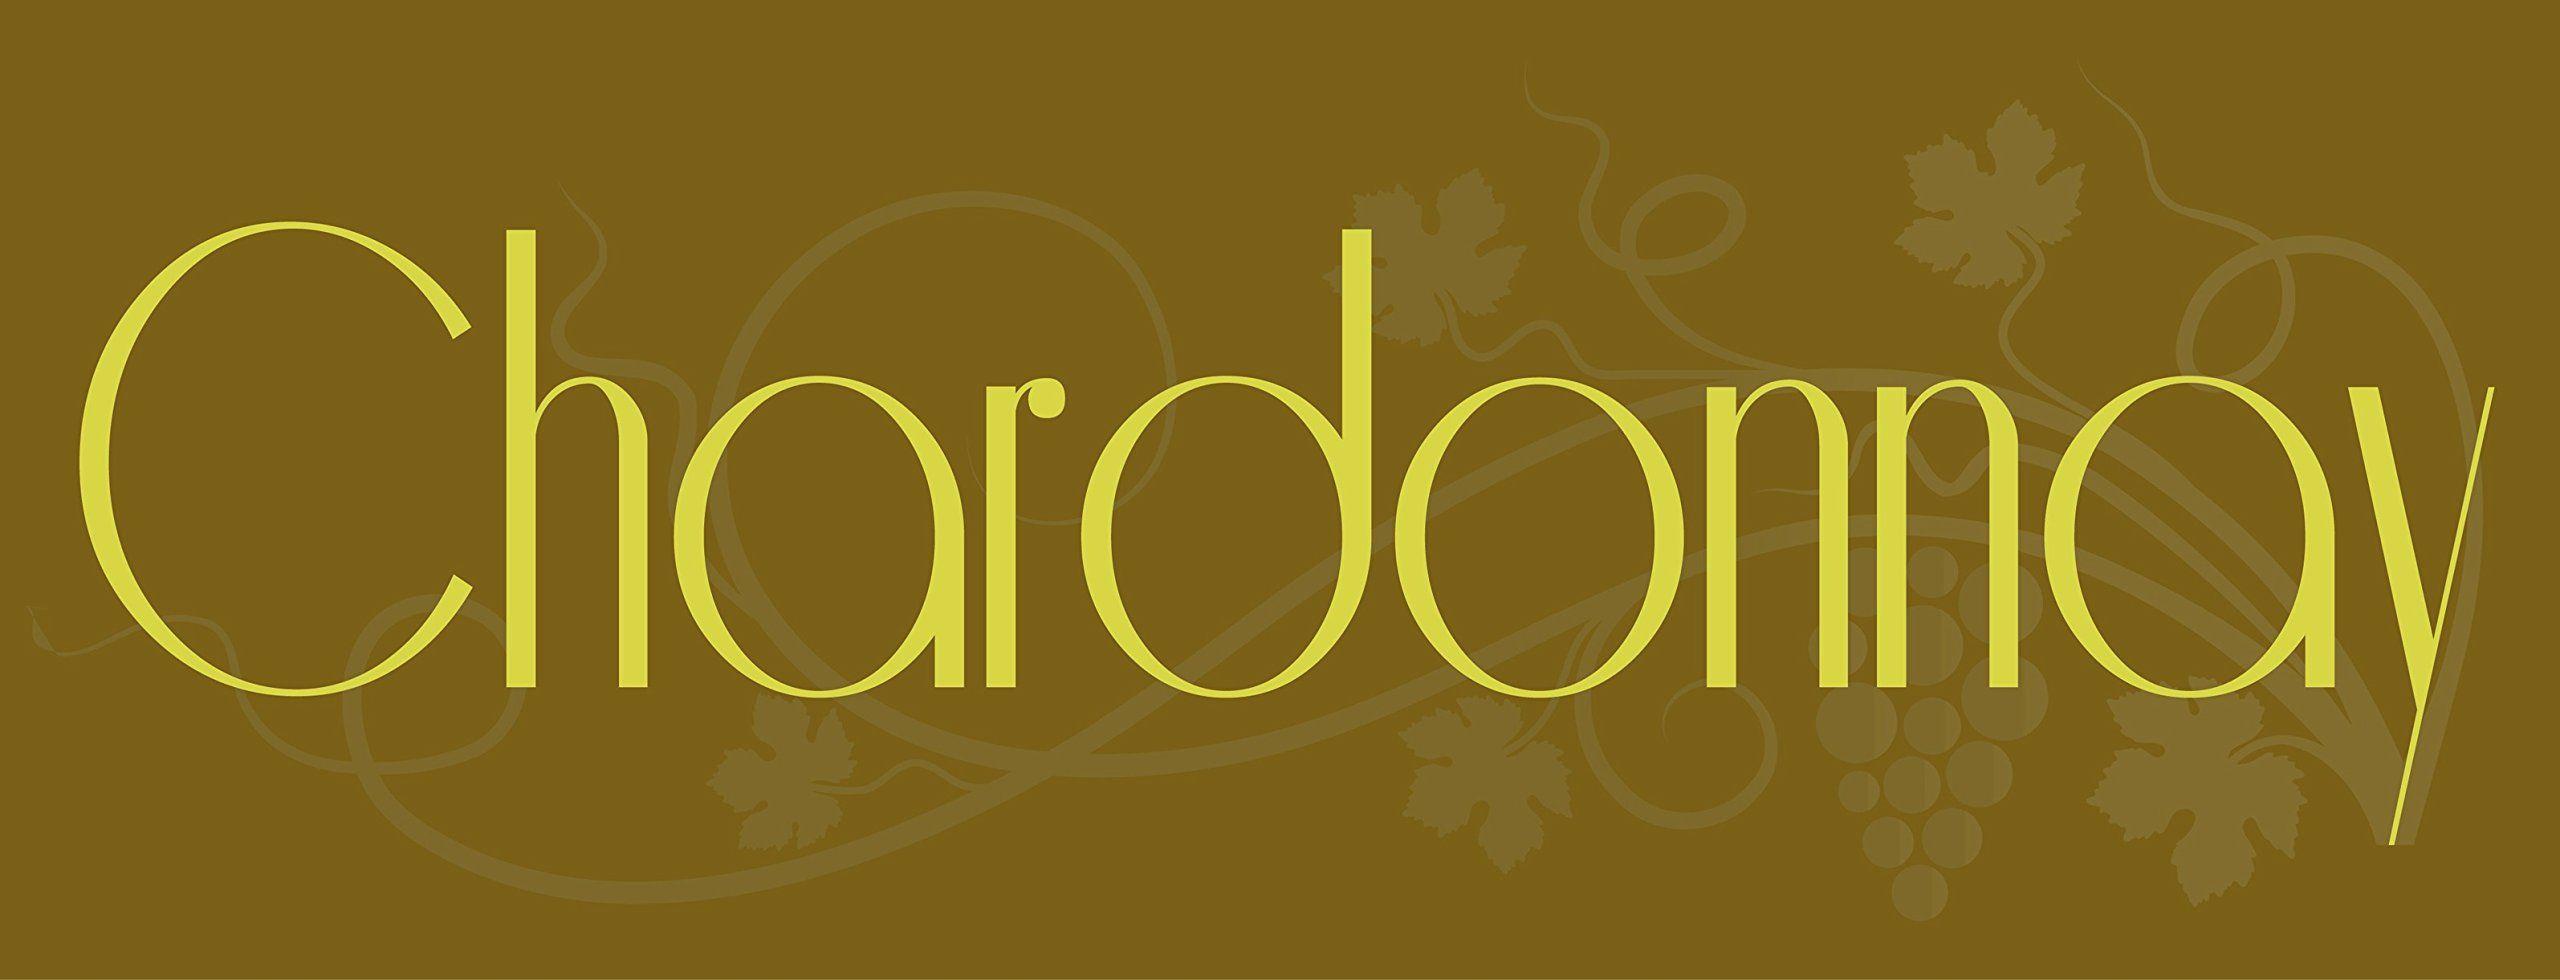 Chardonnay Wine Metal Sign, Elegant Family Room, Bar, Den, Pub Decor ...